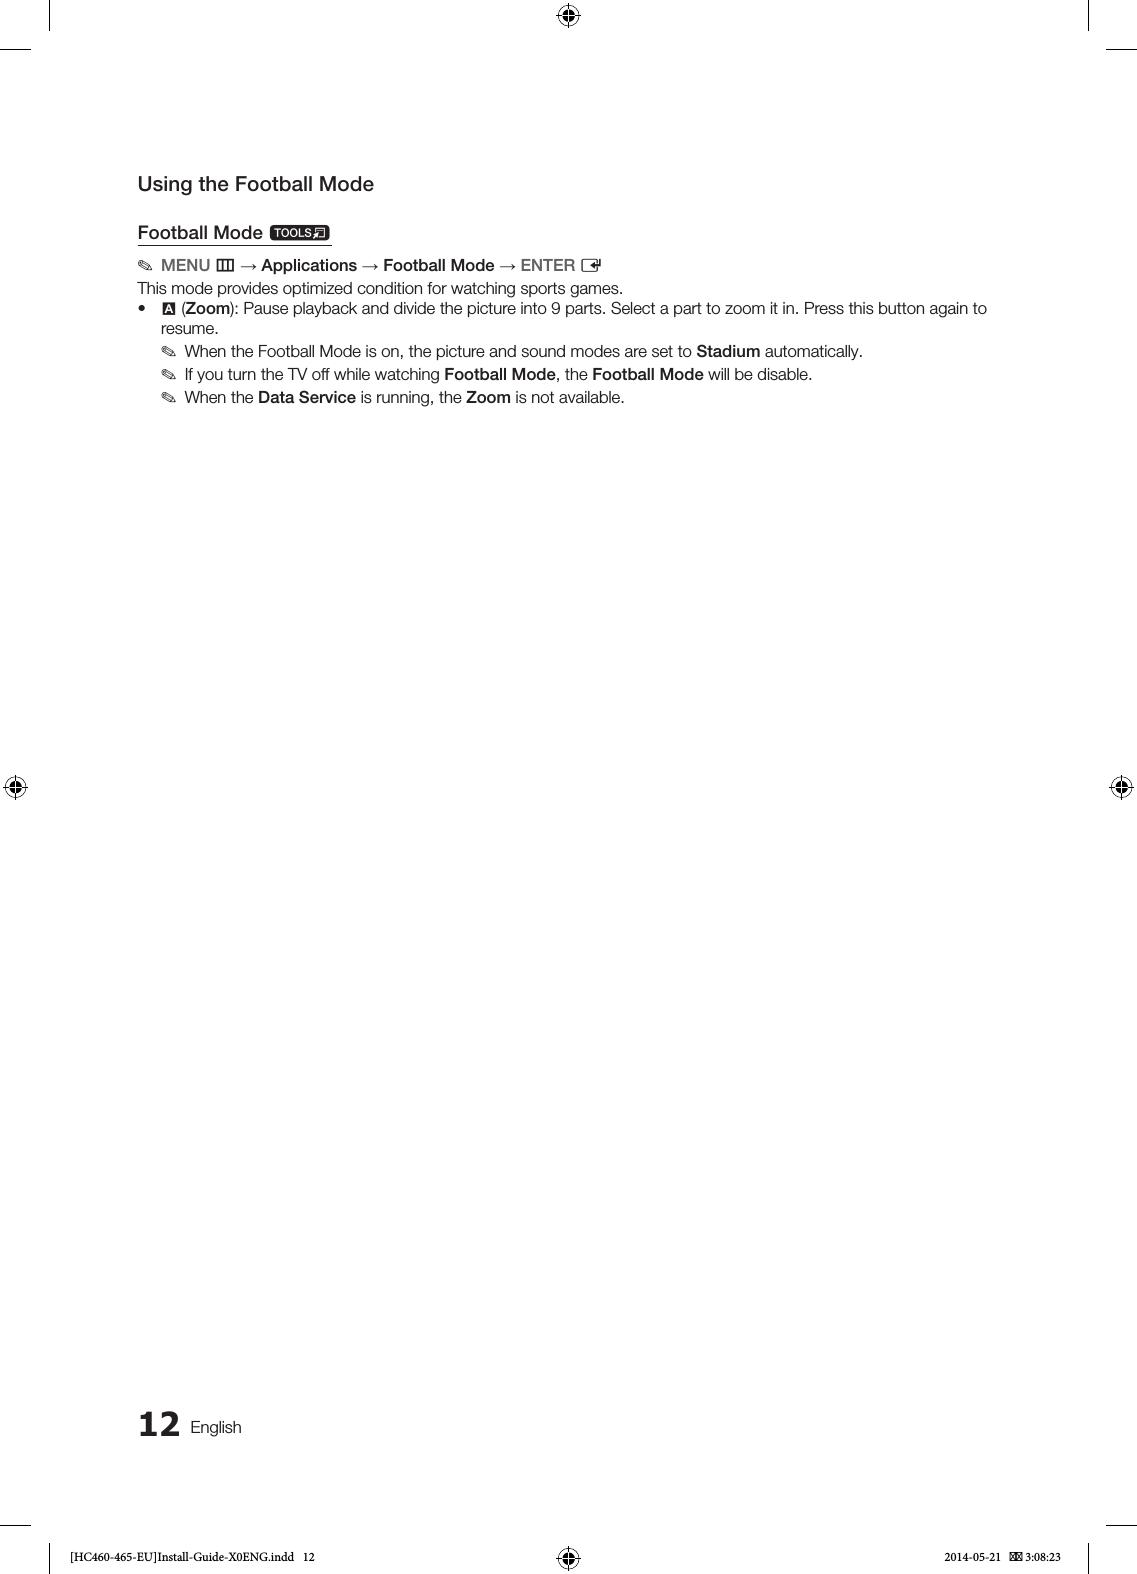 samsung tv instruction manual